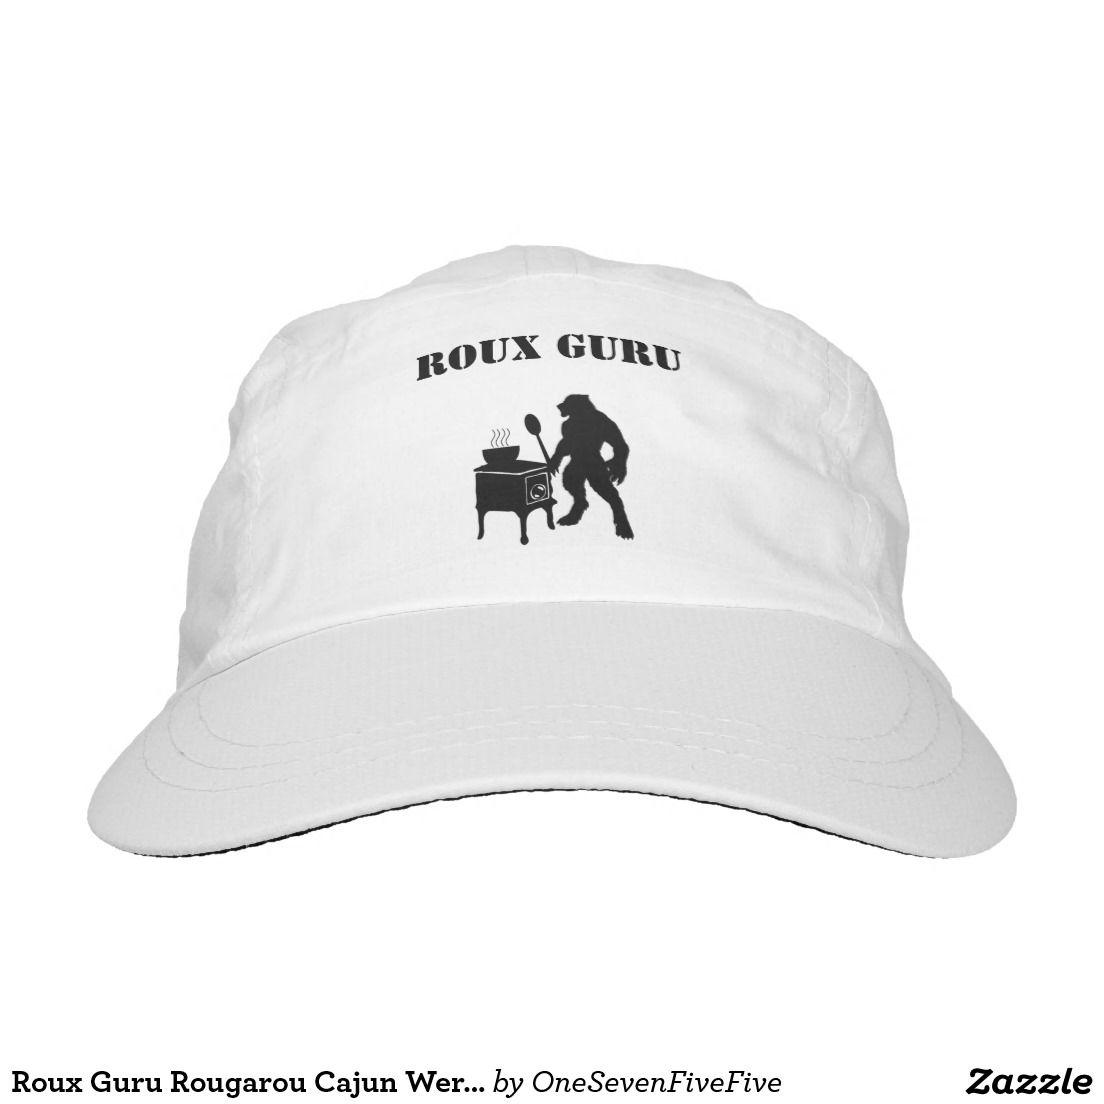 b04d971e448 Roux Guru Rougarou Cajun Werewolf Trucker Hat This design is a fun play on  words starring the legendary Louisiana rougarou. The cajun werewolf is  depicted ...